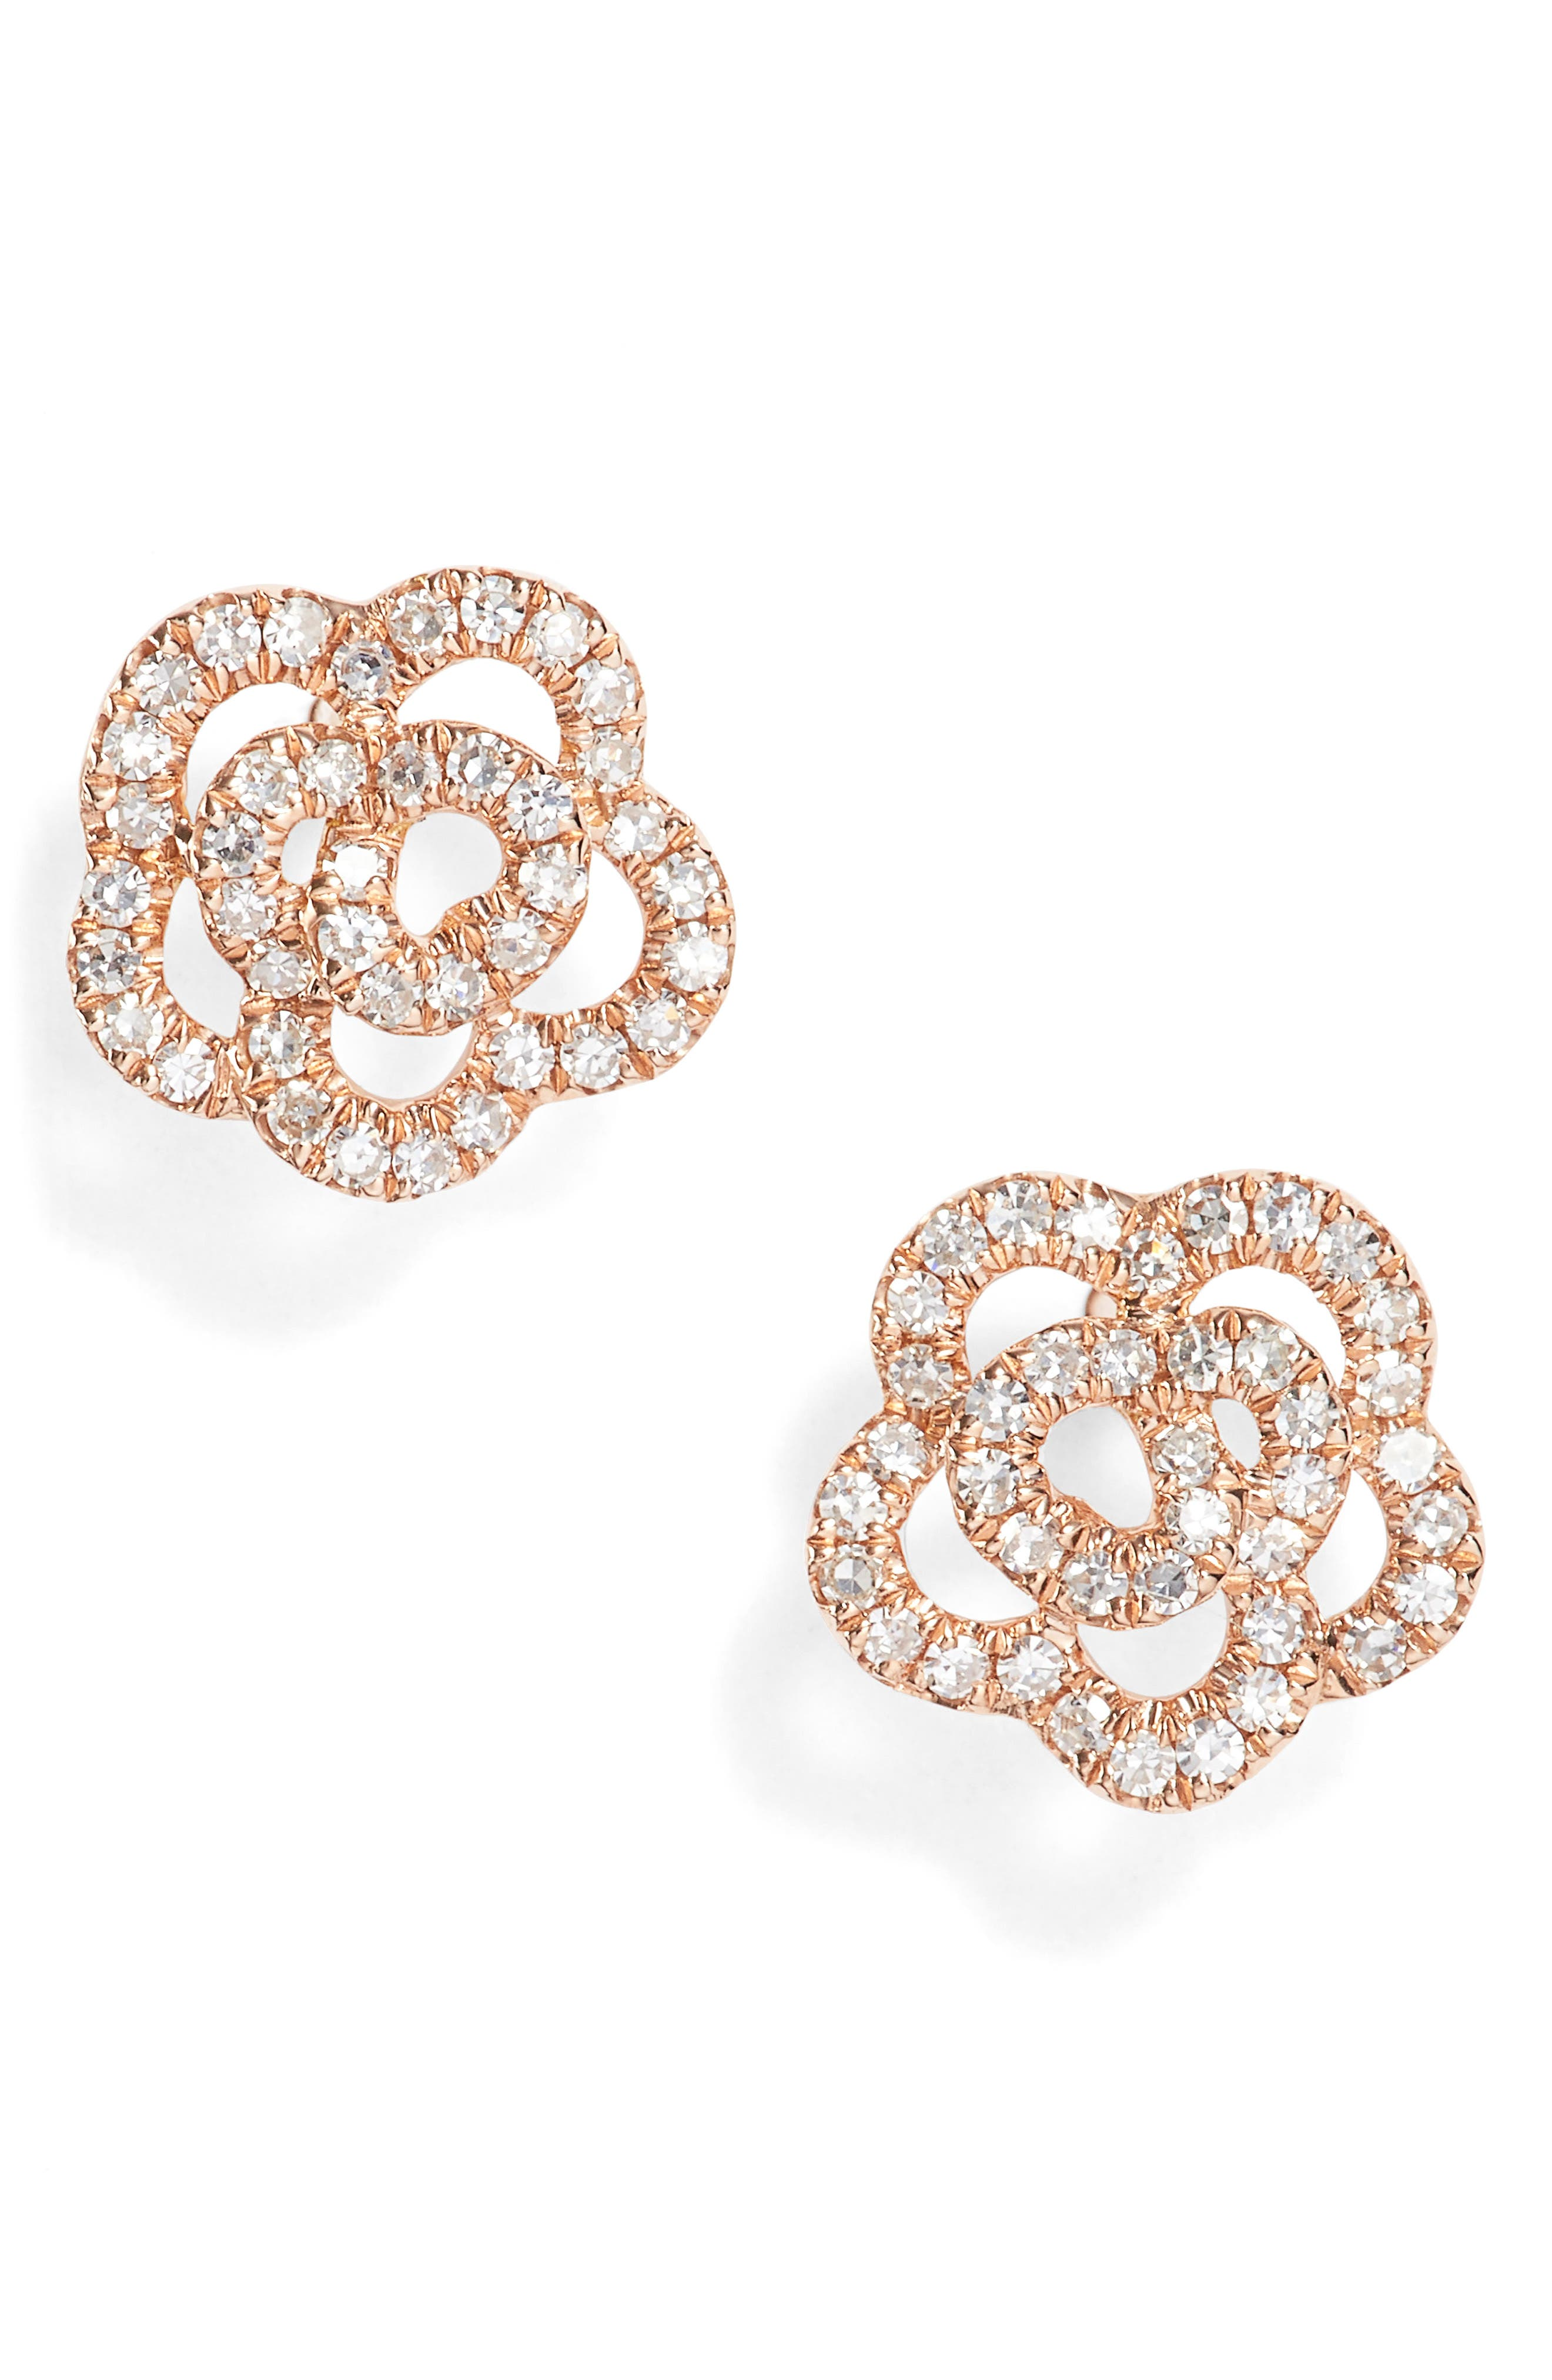 Rose Diamond Stud Earrings,                             Main thumbnail 1, color,                             ROSE GOLD